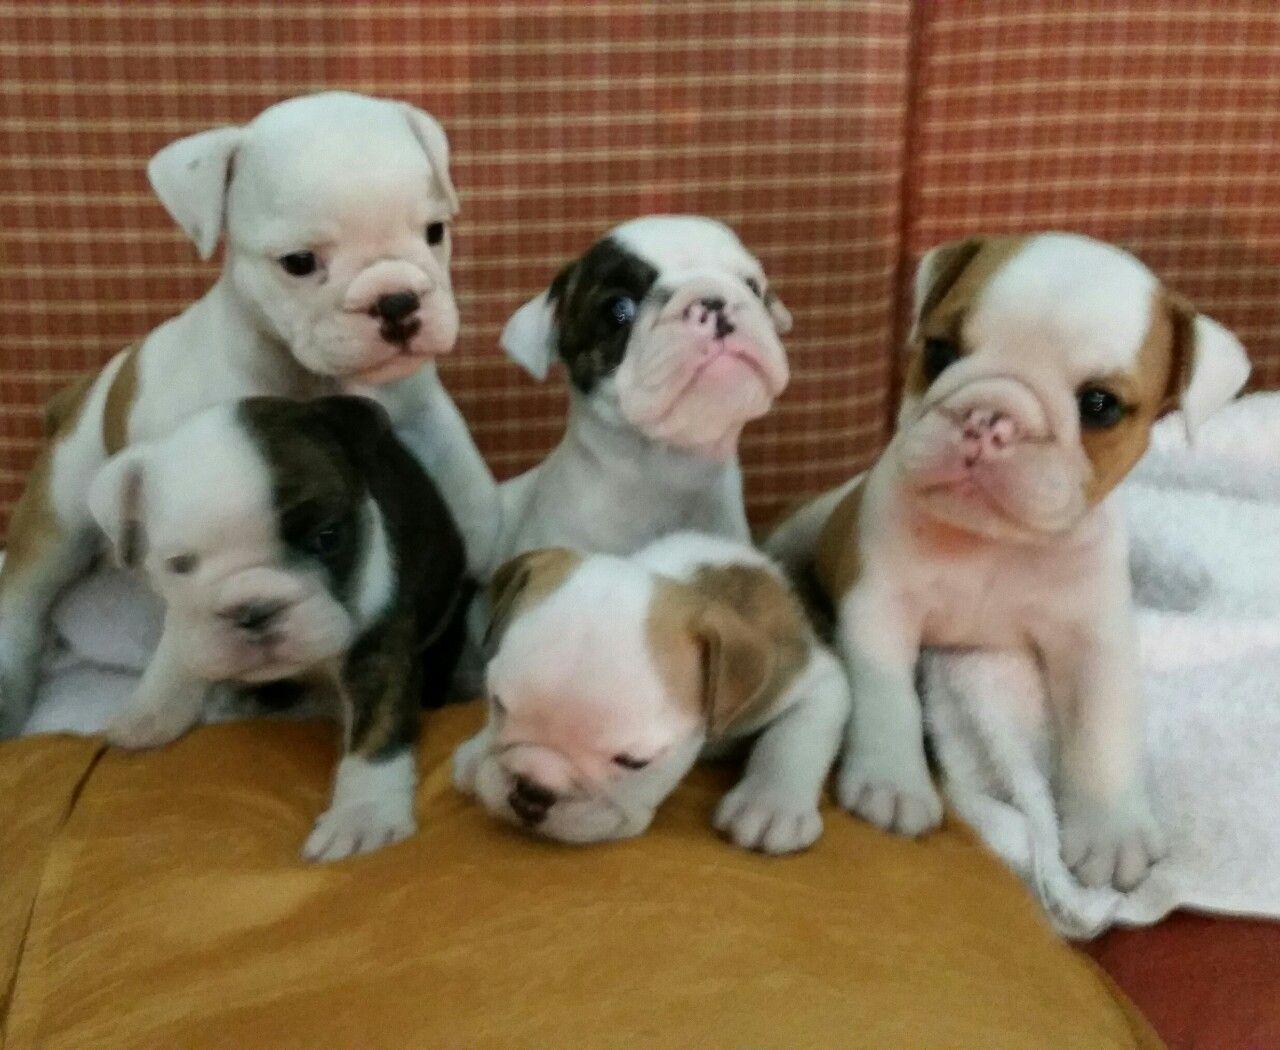 English Bulldog Puppies So Precious At Only 1 Month Old